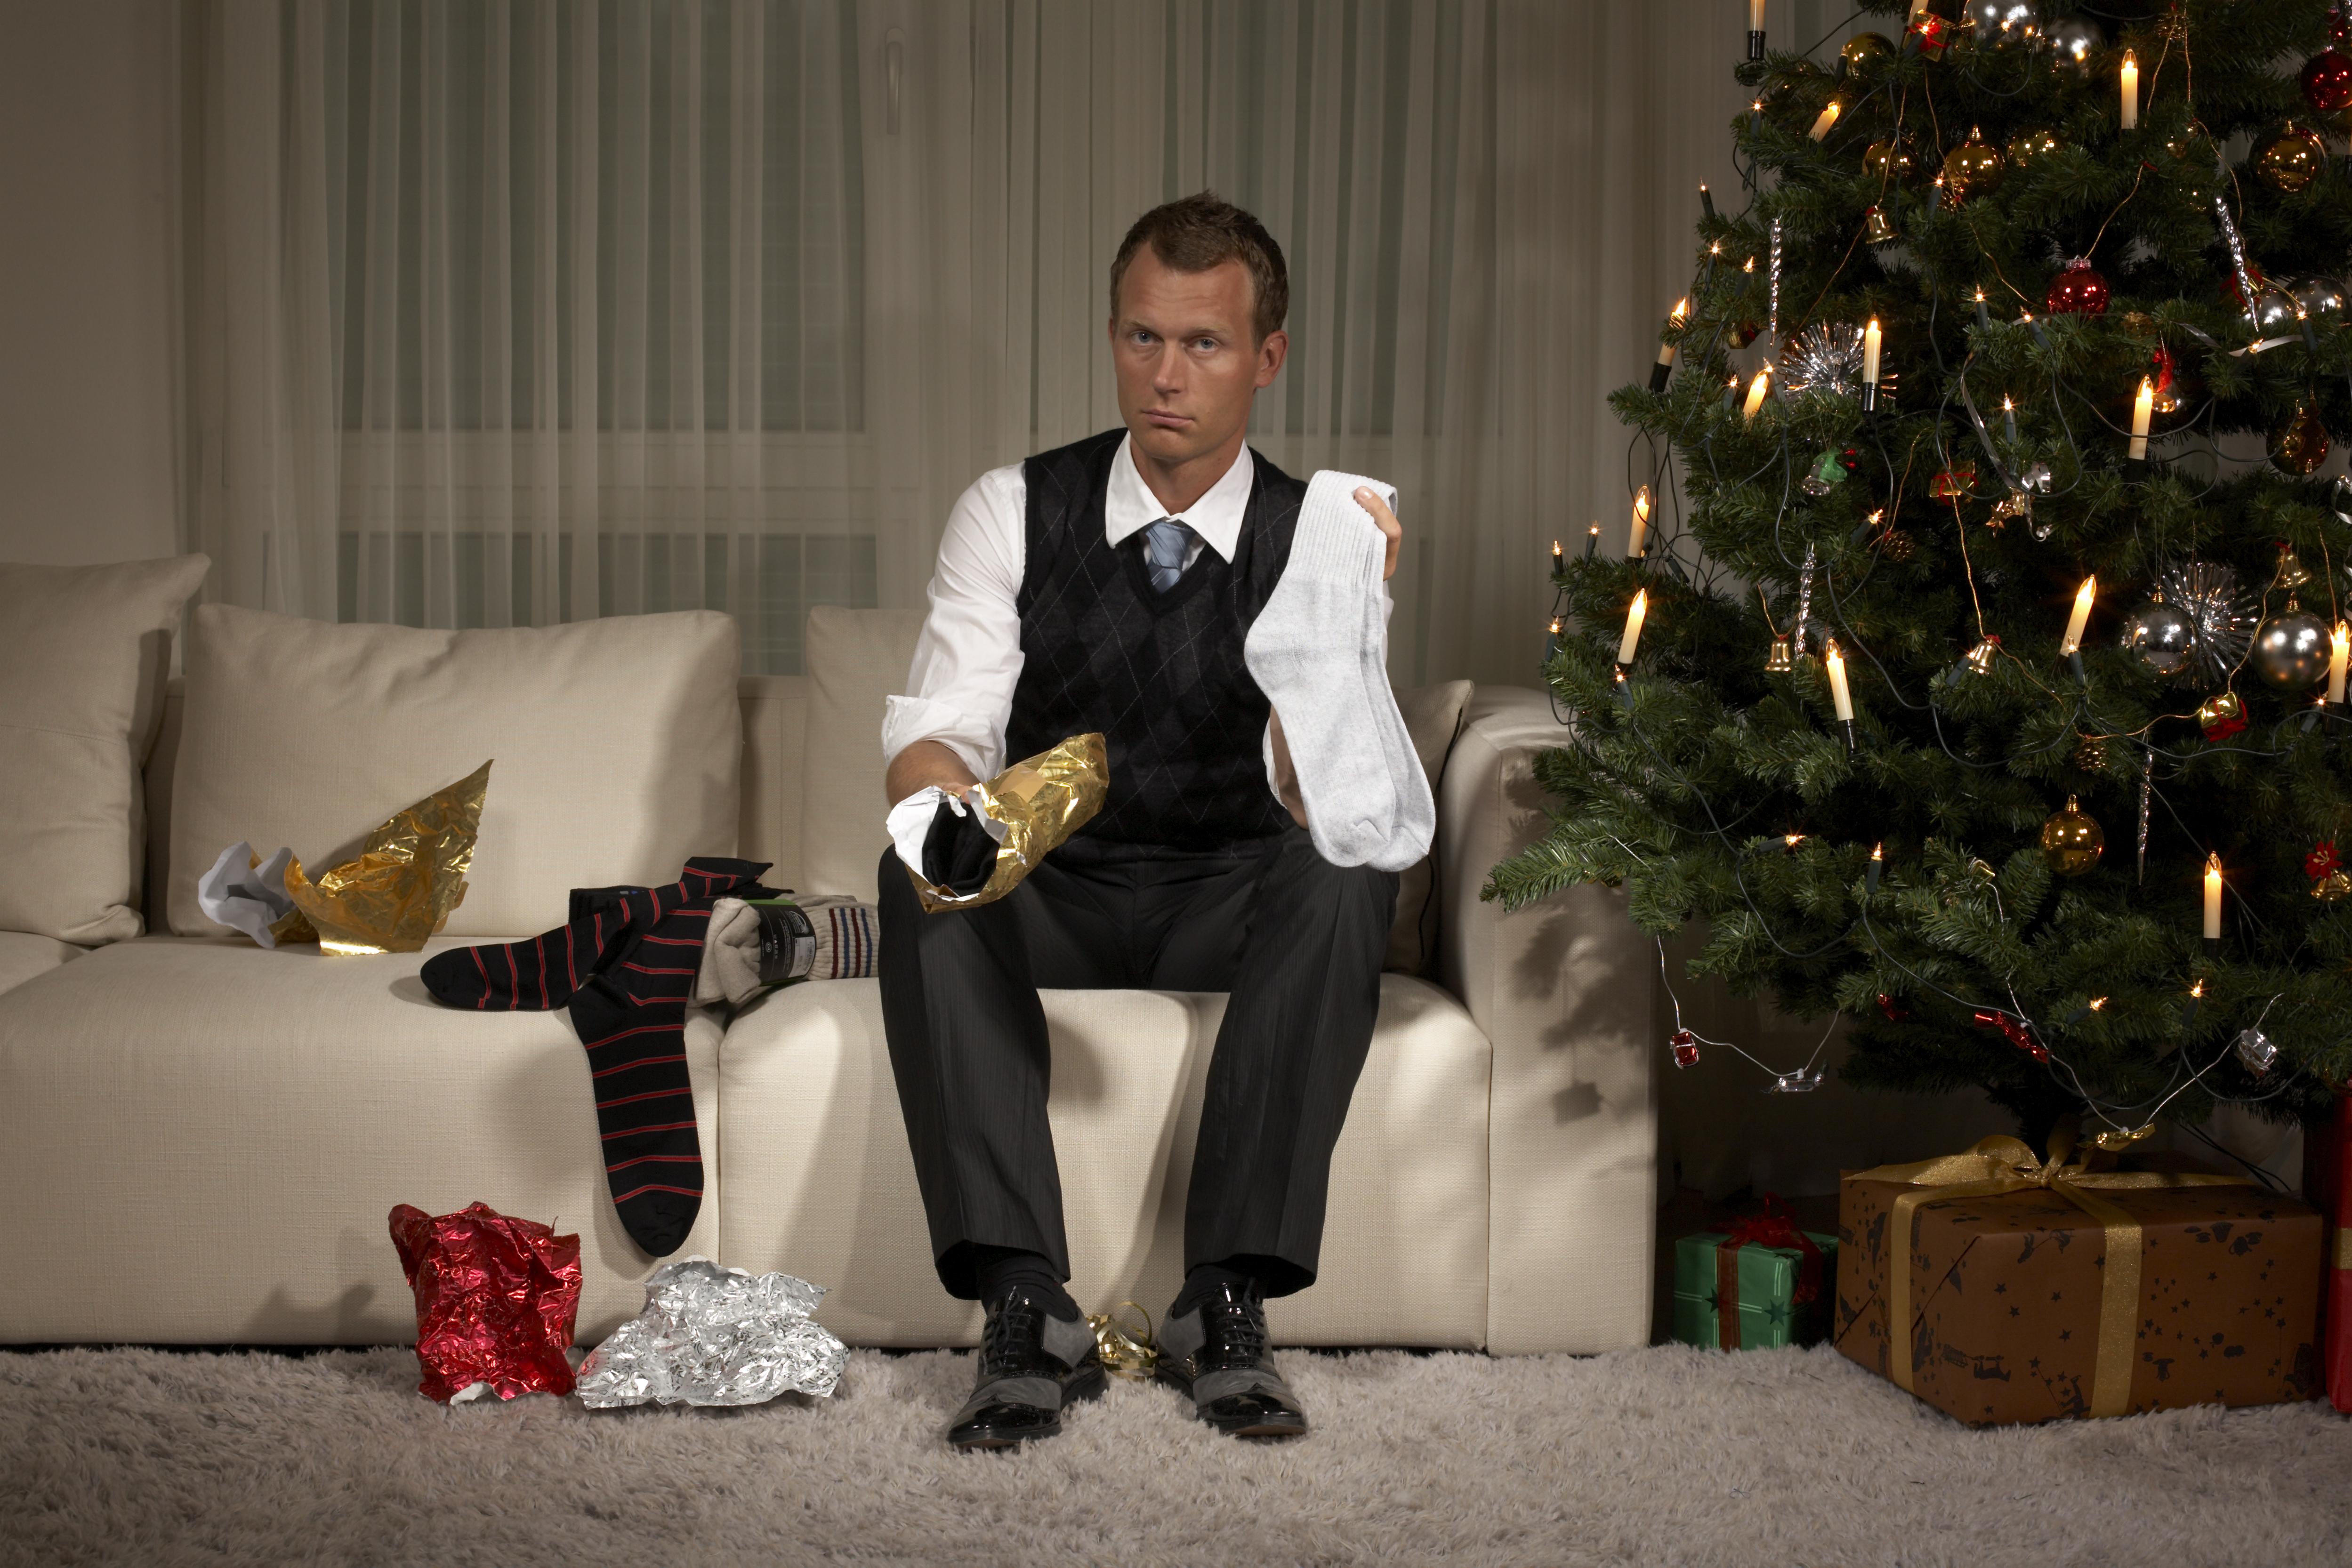 A man receiving socks at Christmas